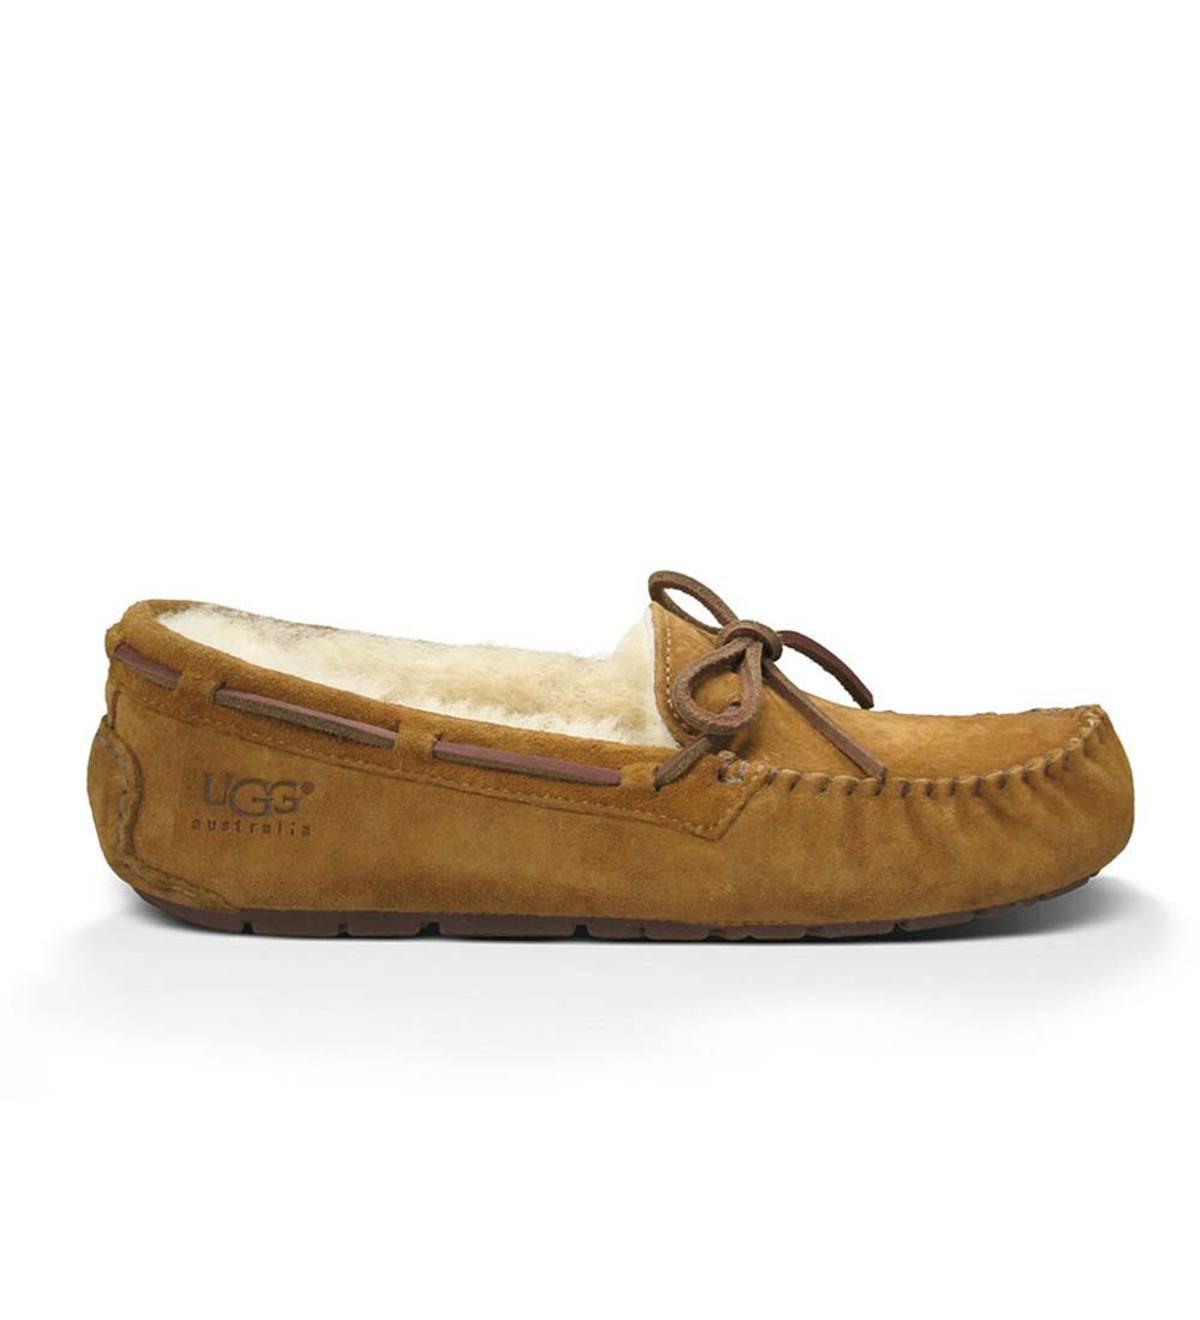 cb4ae2d5ad5 UGG Australia Womens Dakota Moccasin Slippers | PlowHearth